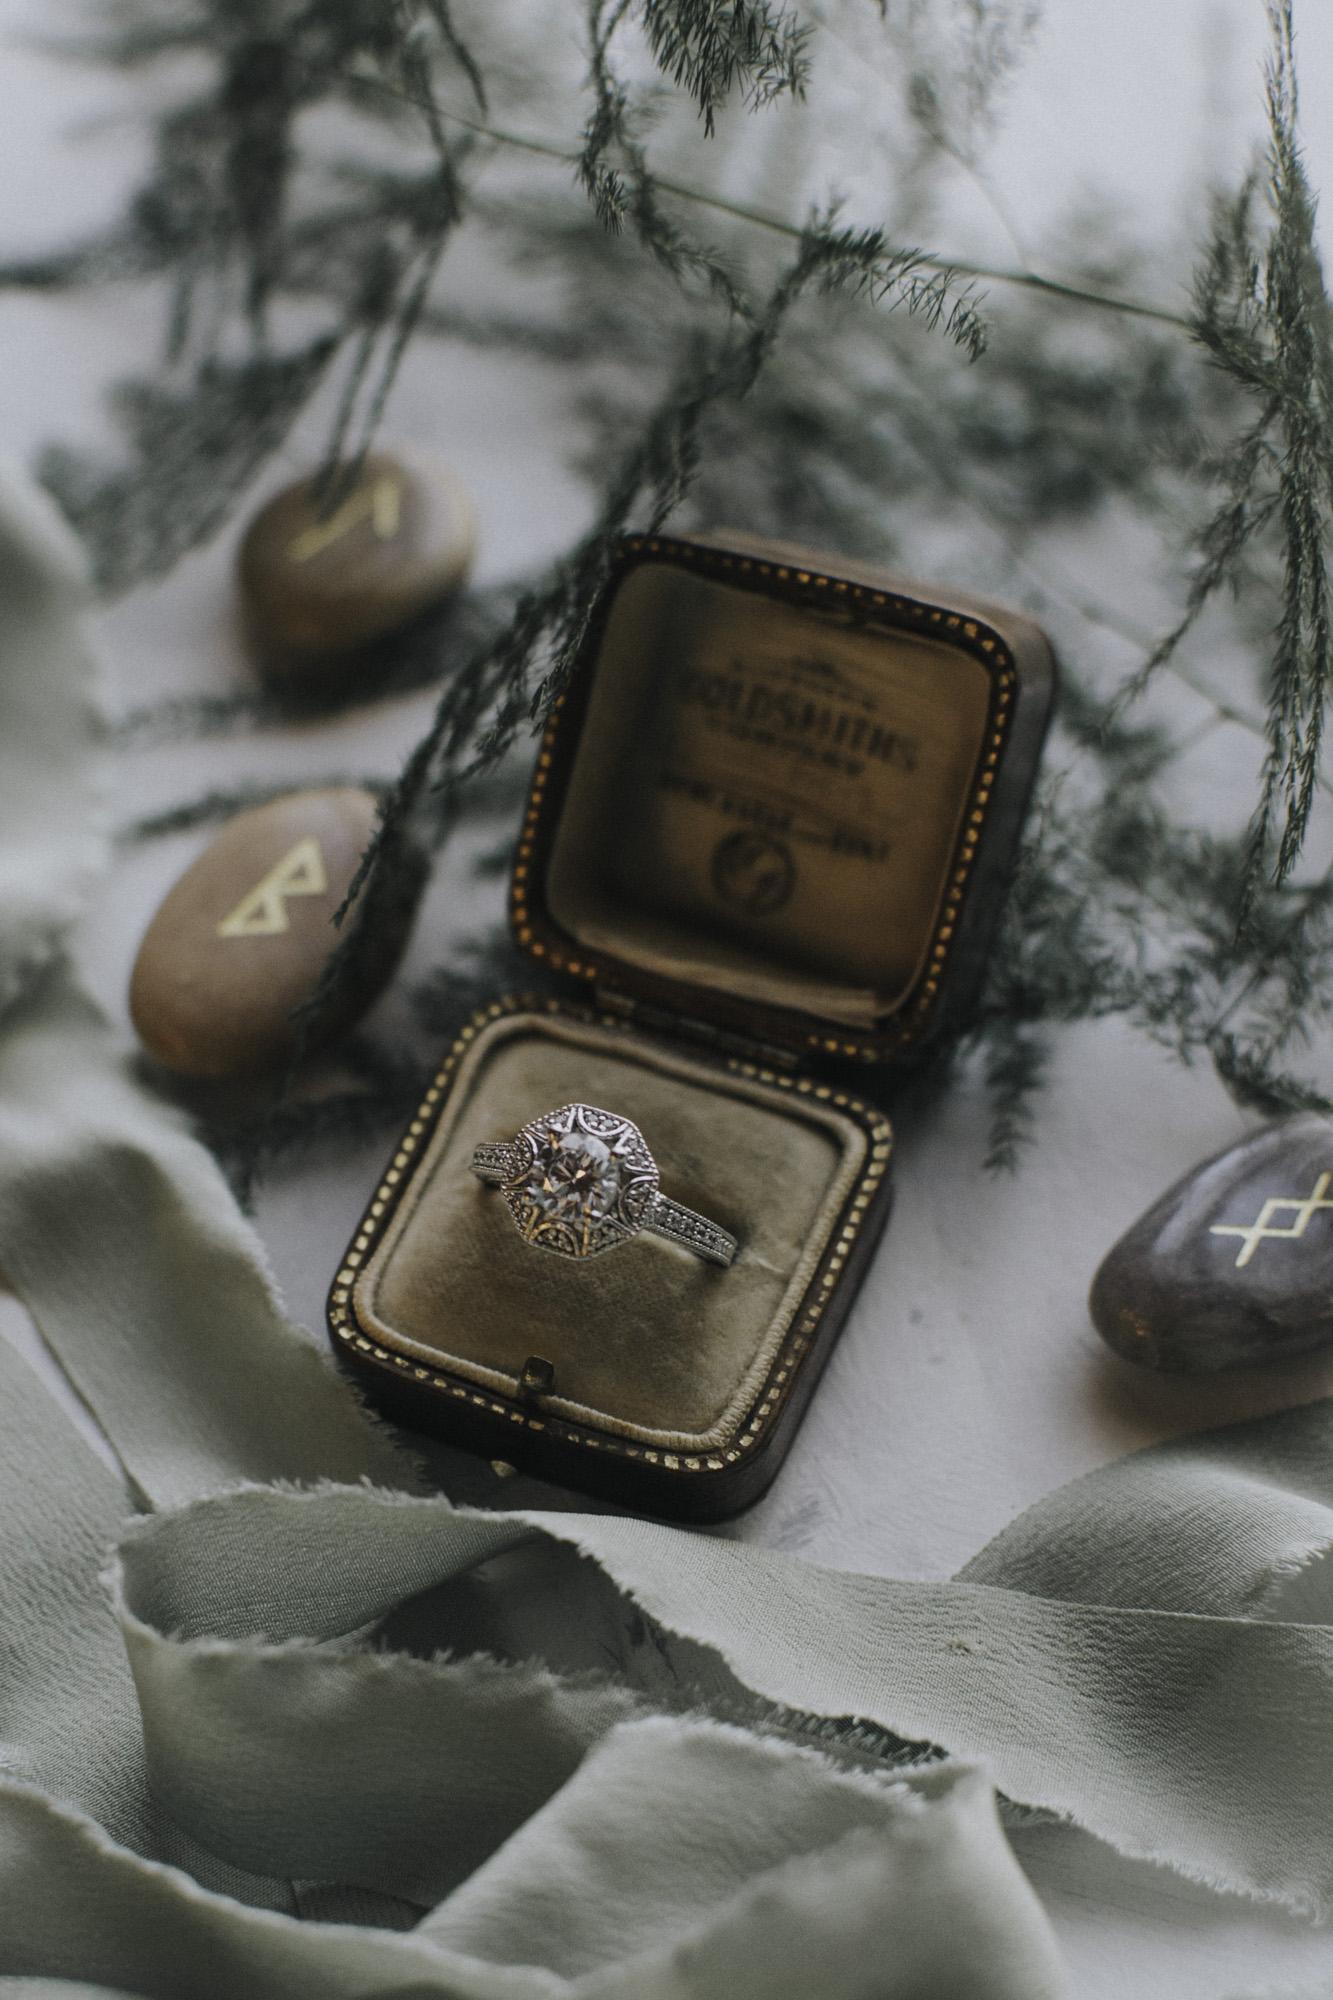 Cate_Ann_Photography_Dayton_Ohio_Wedding_Elopement_And_Engagement_PhotographerDSC_6423.jpg